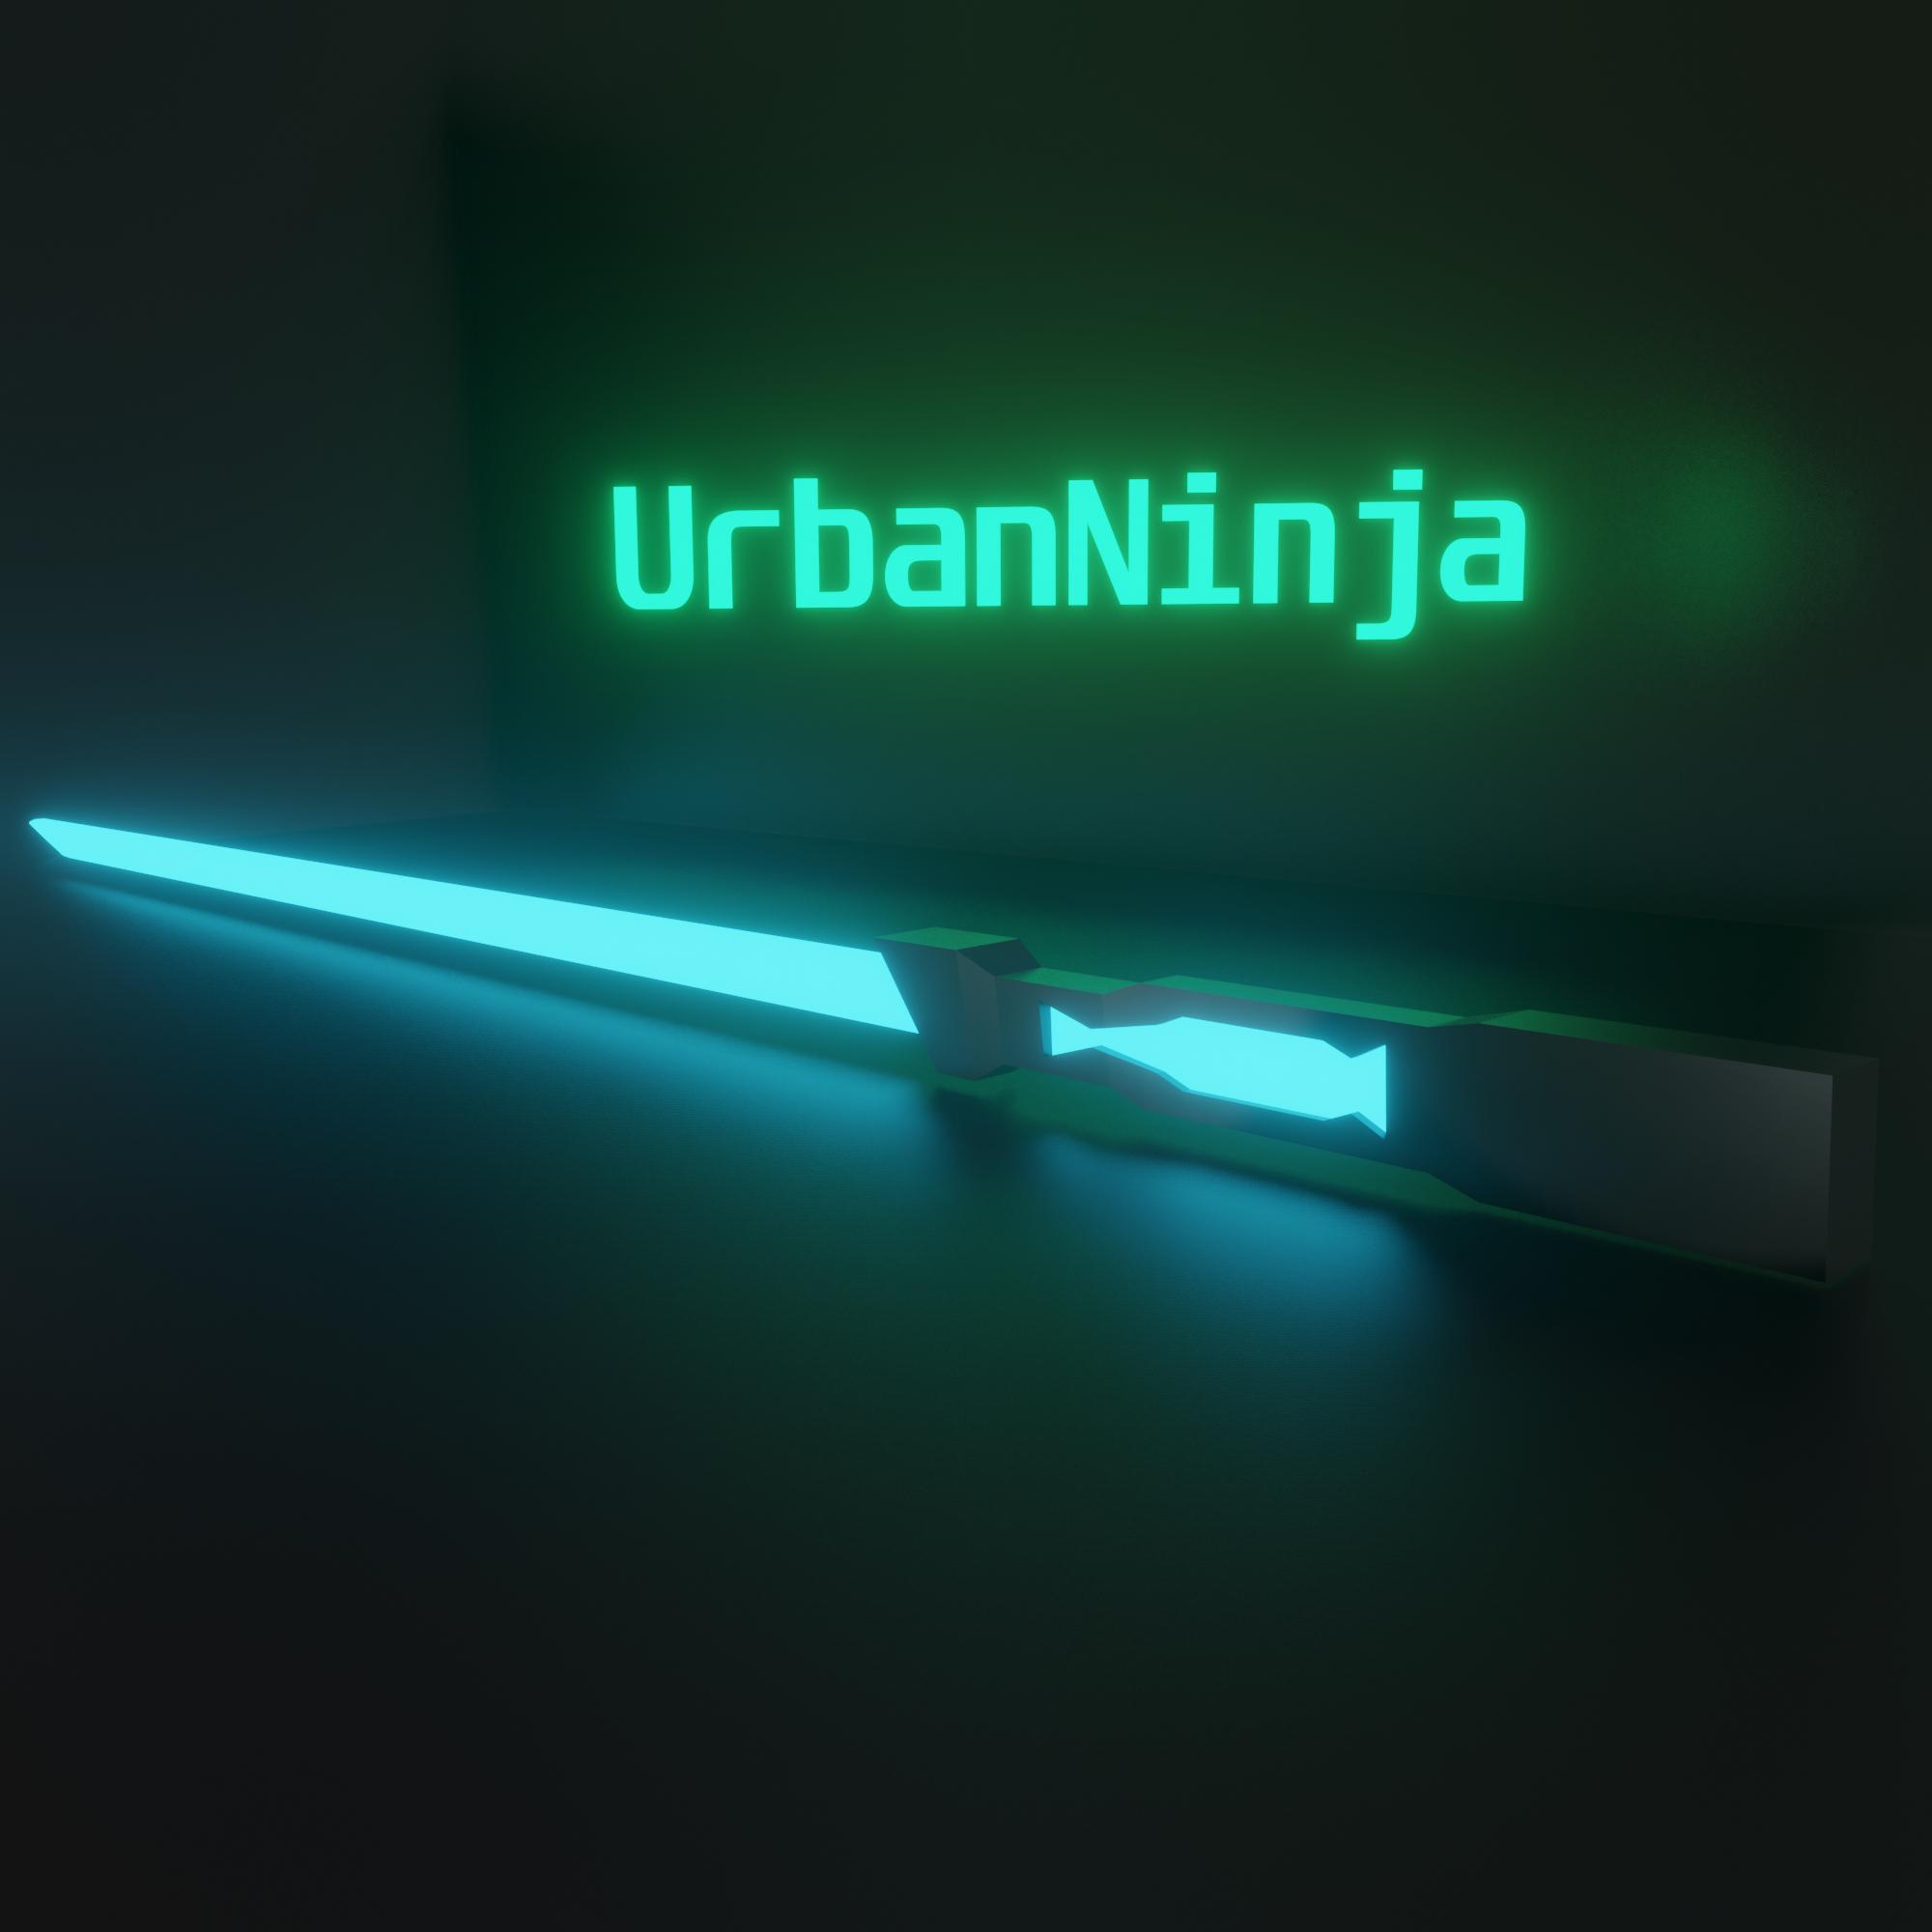 UrbanNinja